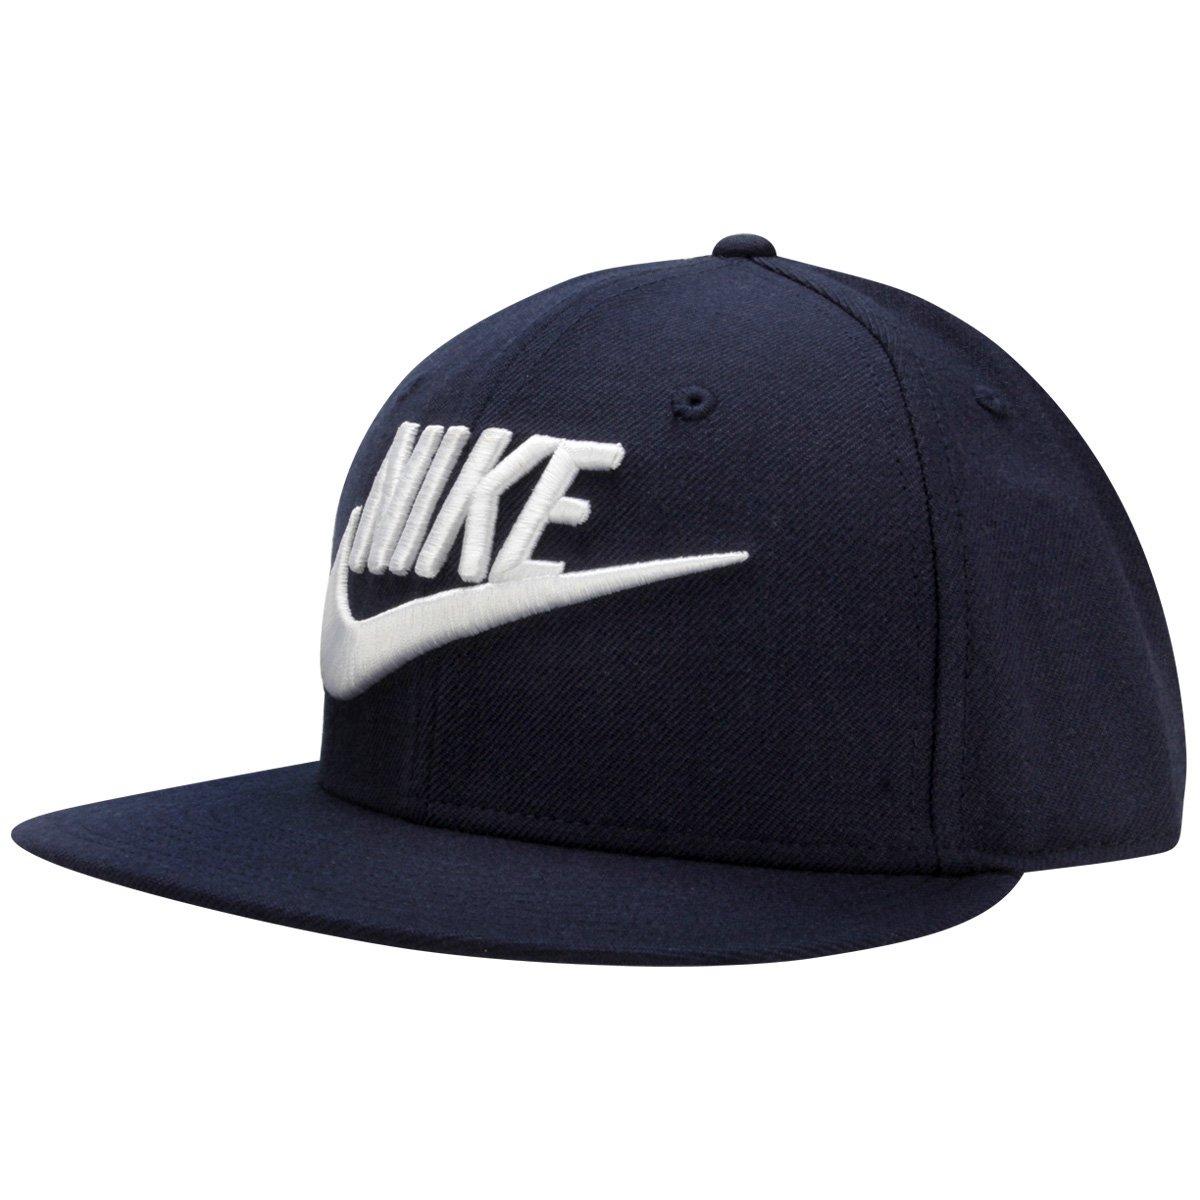 Boné Nike Aba Reta True - Compre Agora  2d5aaddcd36